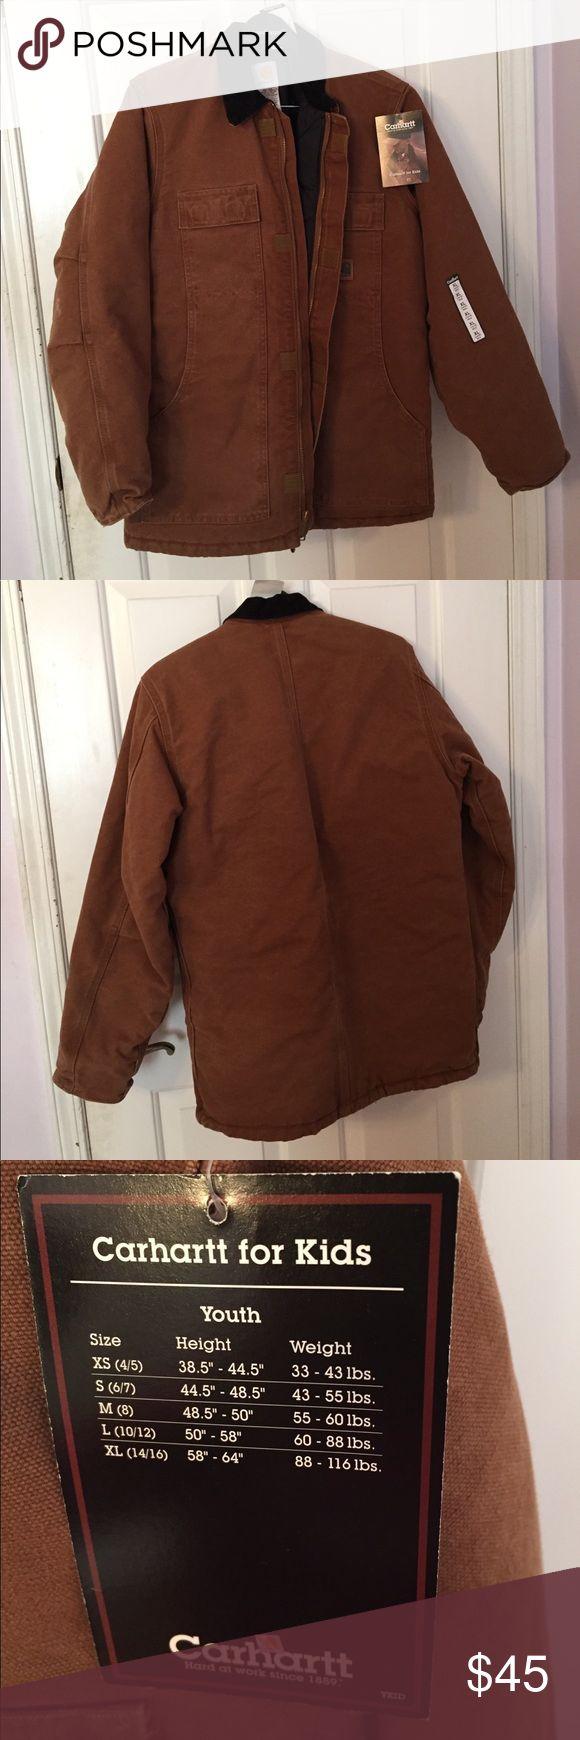 Kids Carhartt winter jacket Kids Carhartt chestnut color winter jacket. Heavily lined with black quilt material . NWT Carhartt Jackets & Coats